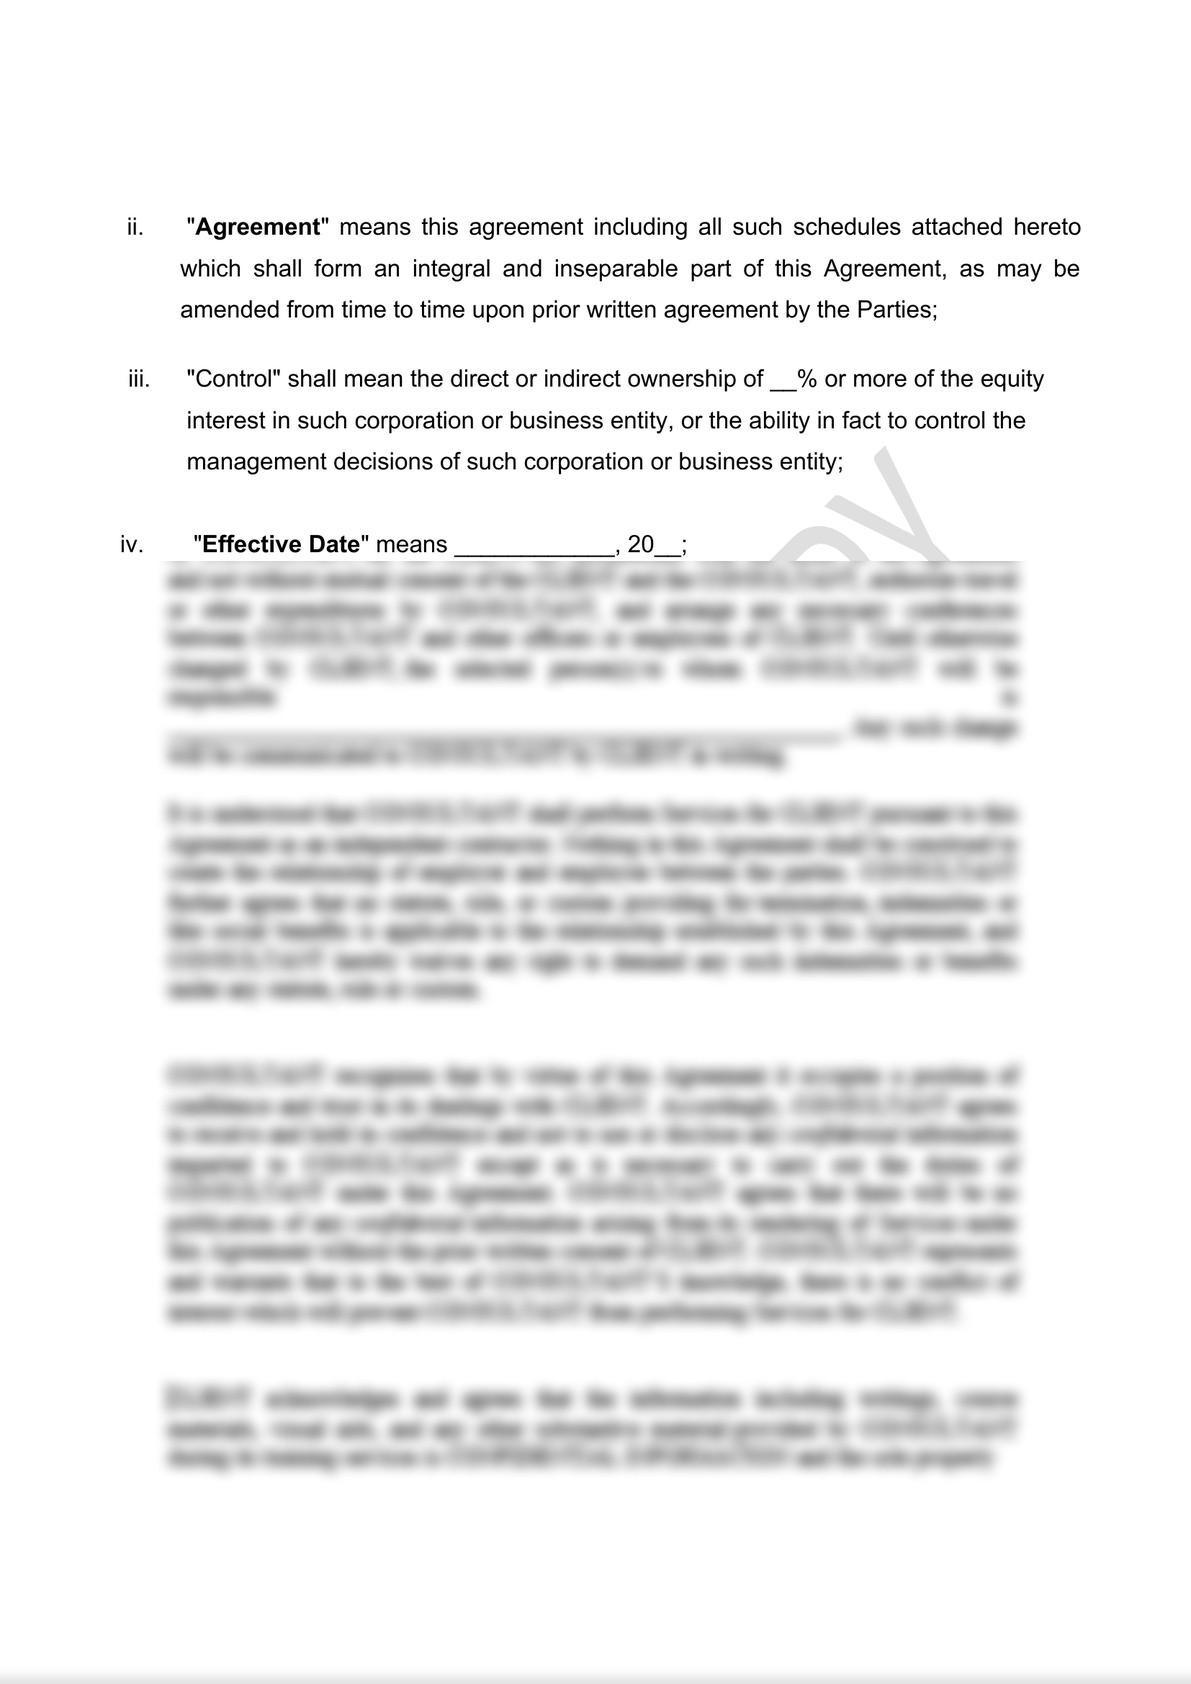 Distribution Agreement Draft (iii)-1